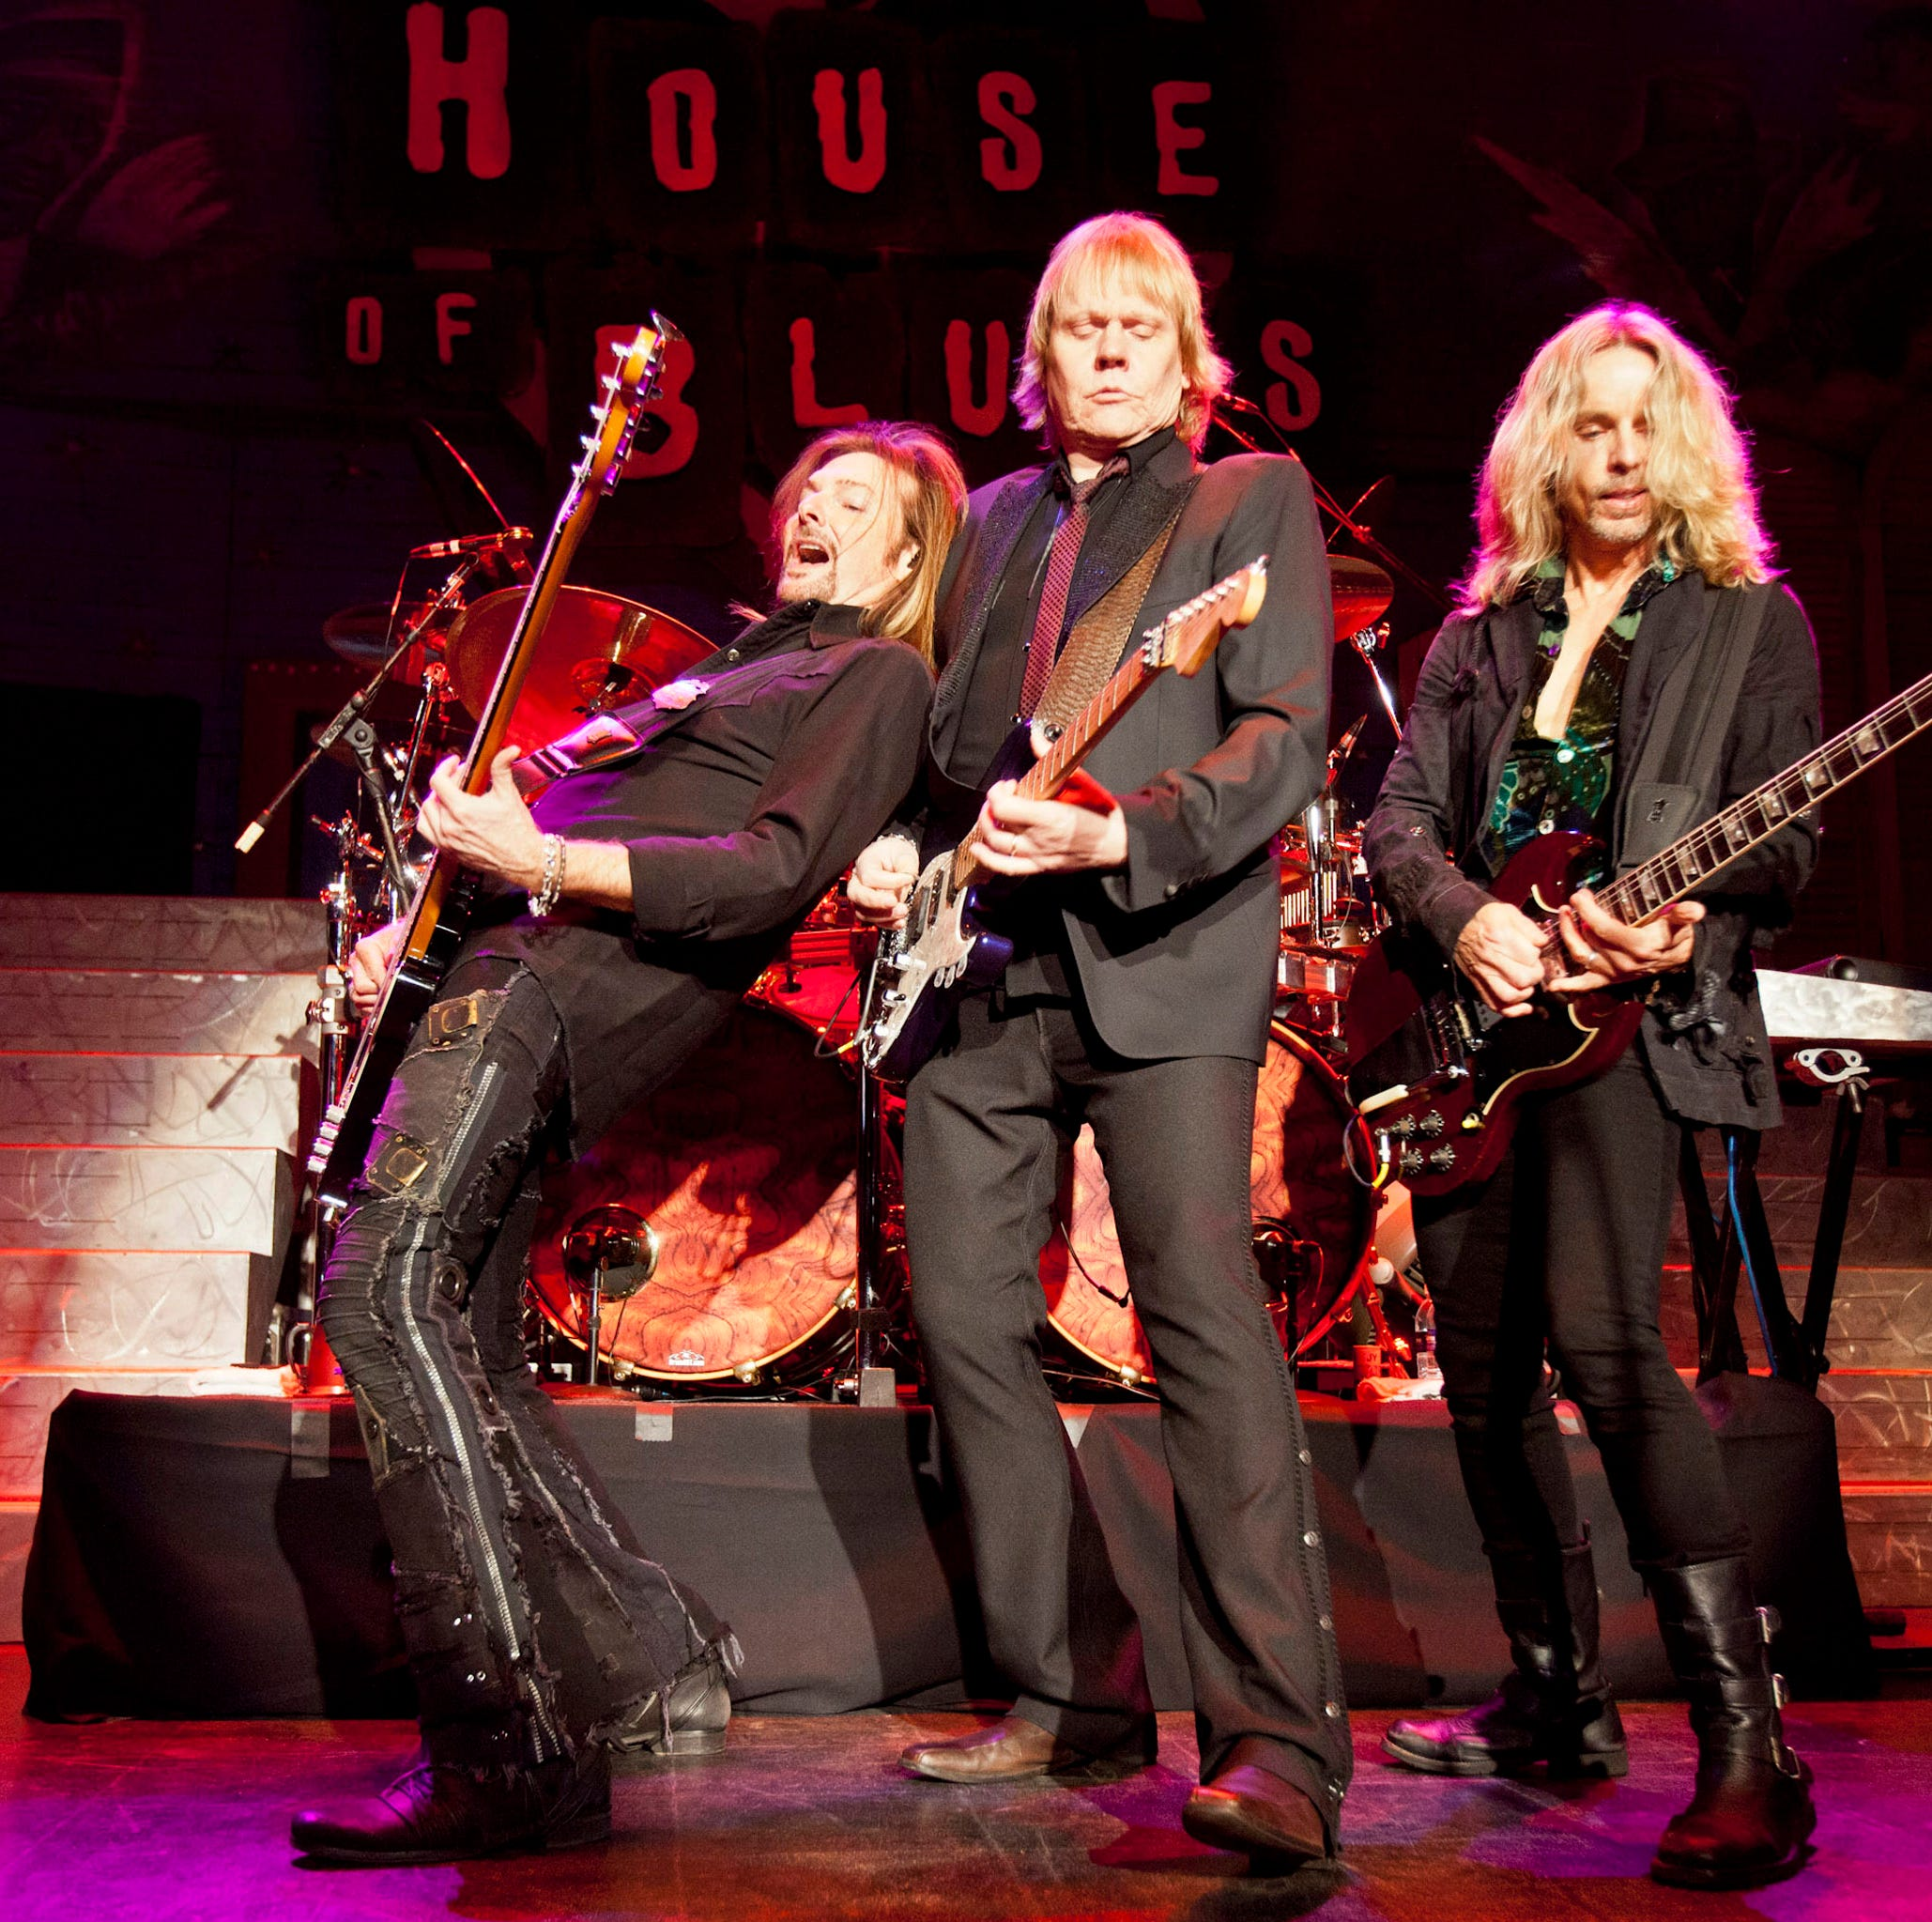 Styx, Ann Wilson of Heart keep the classic rock coming at Resch